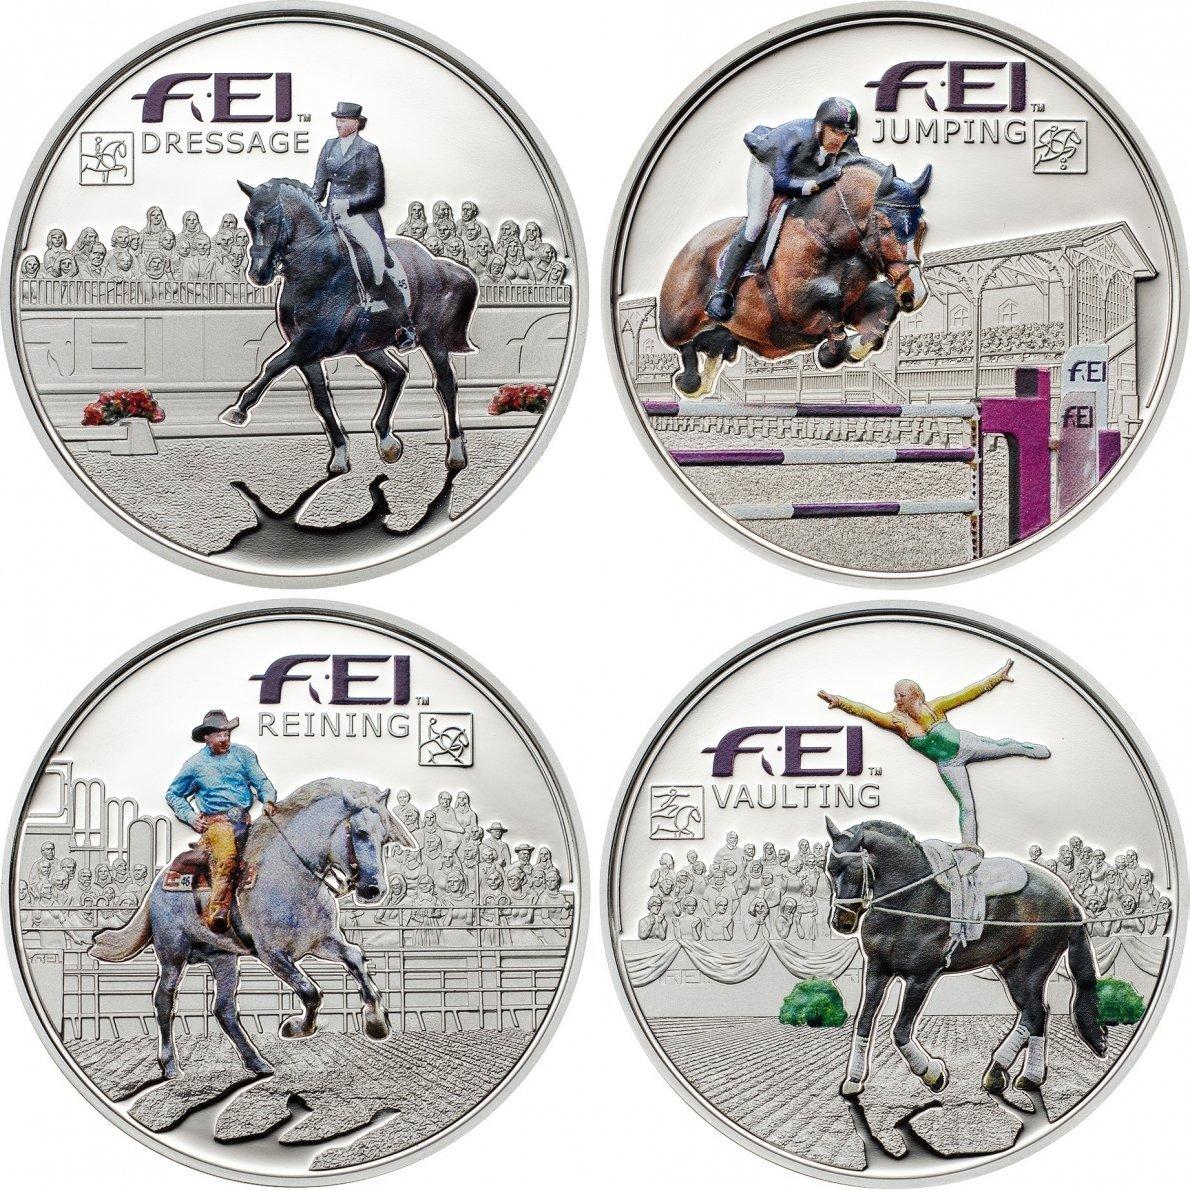 FEI 5 Diners Diners Diners 4-Silbermünzen Set - Andorra 2013 42d281